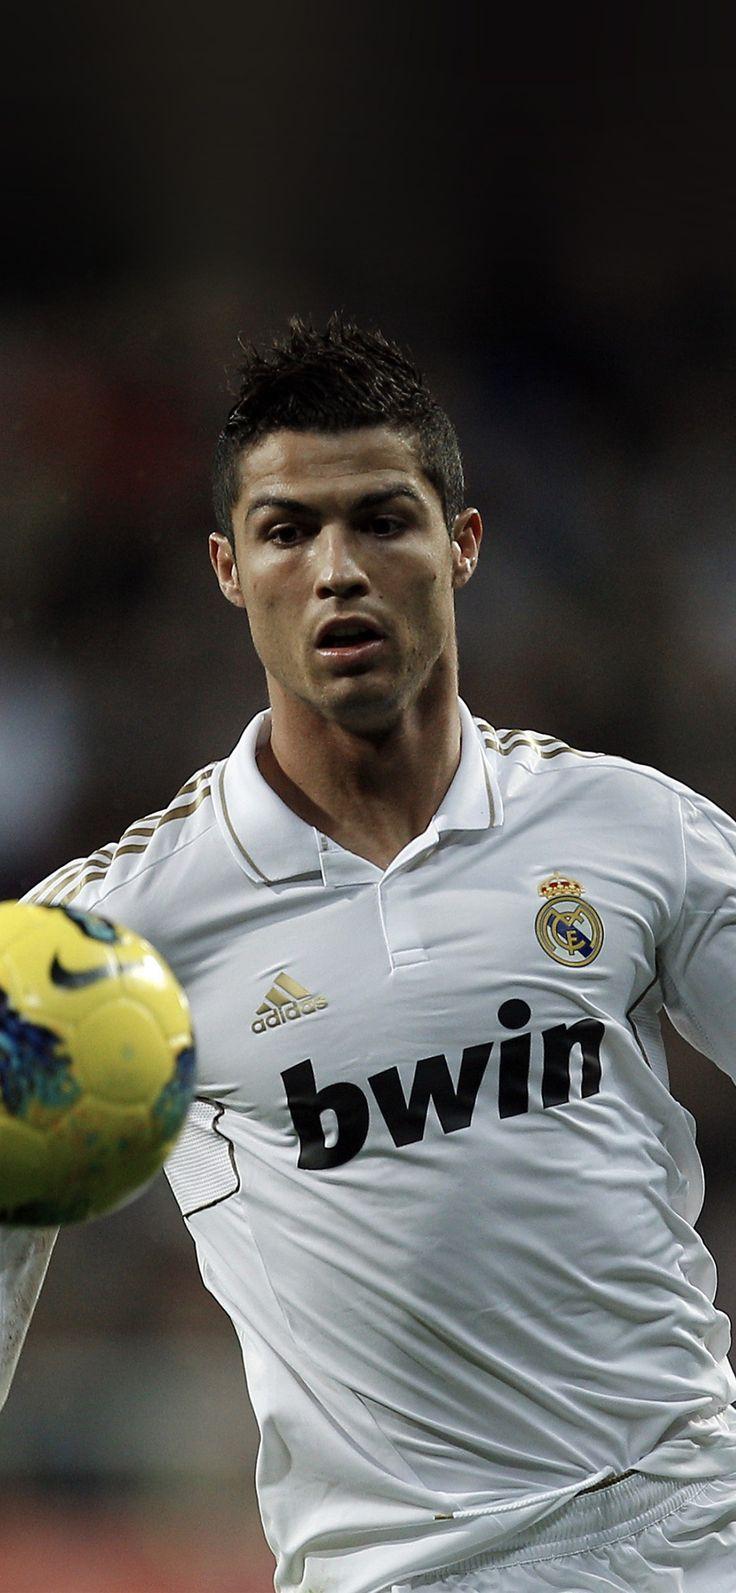 Iphone X Wallpaper Hq05 Ronaldo Football Soccer Realmadrid Sports